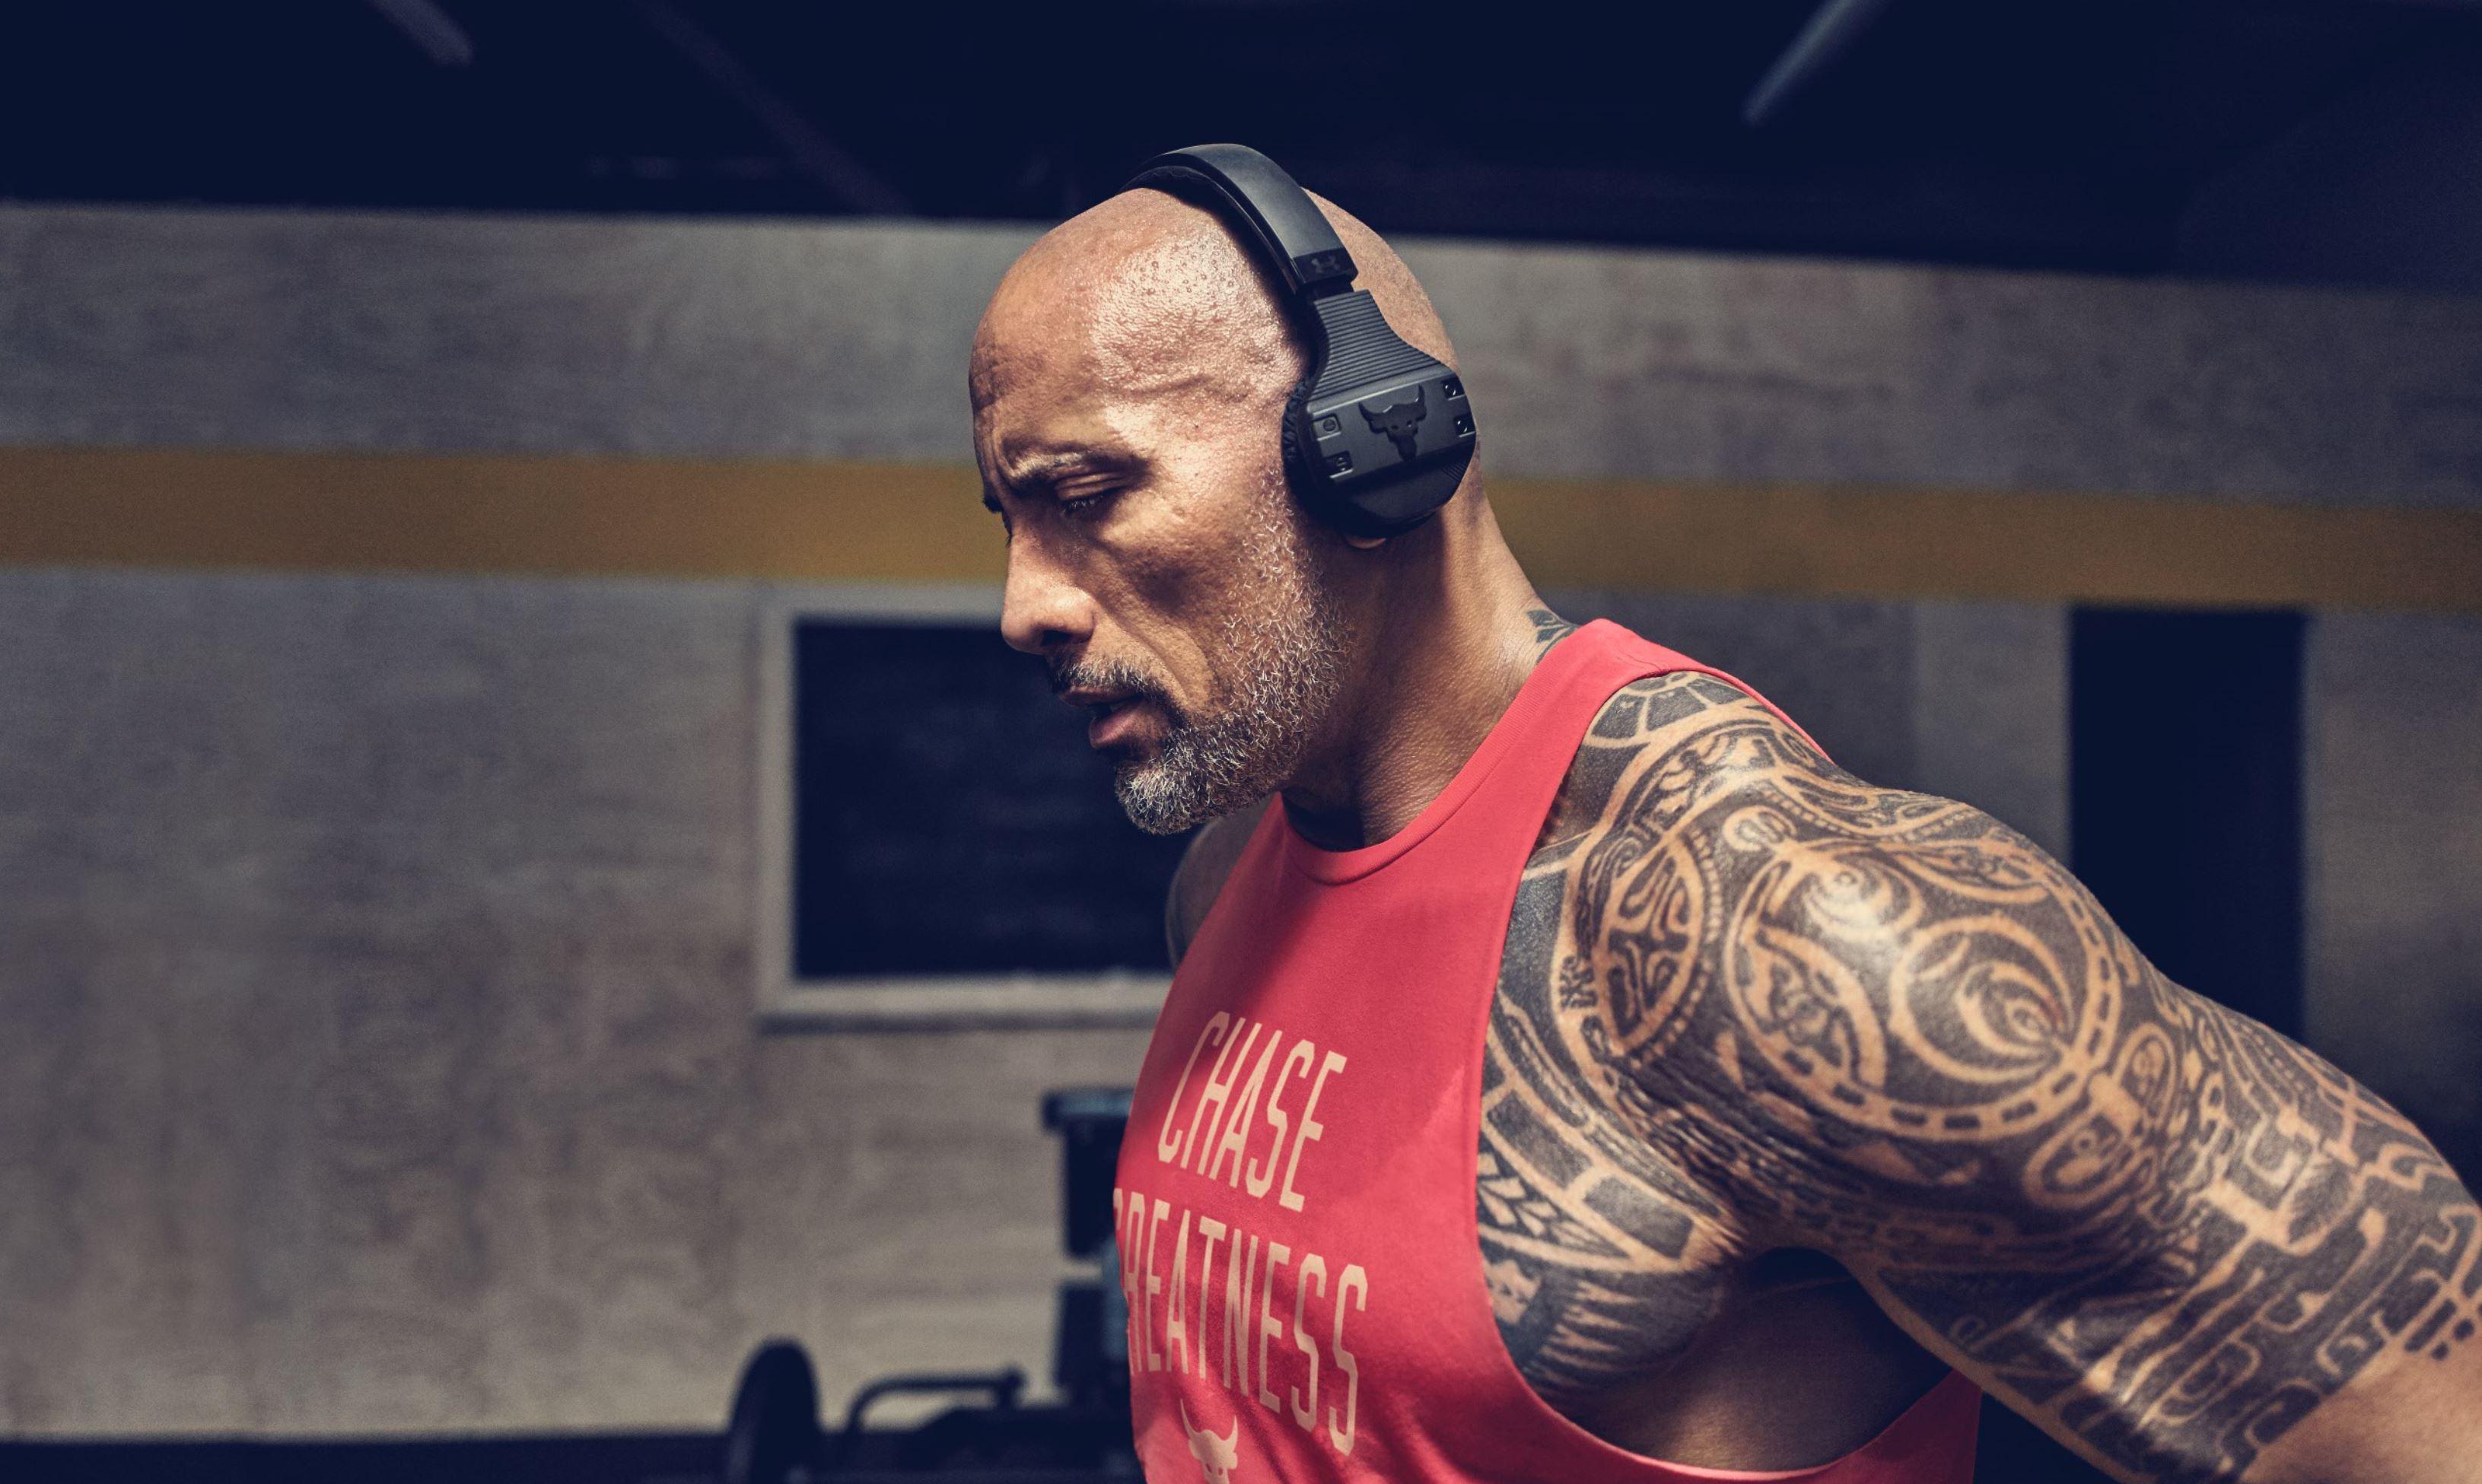 JBL UA Sport Wireless train Headphones project rock dwayne johnson